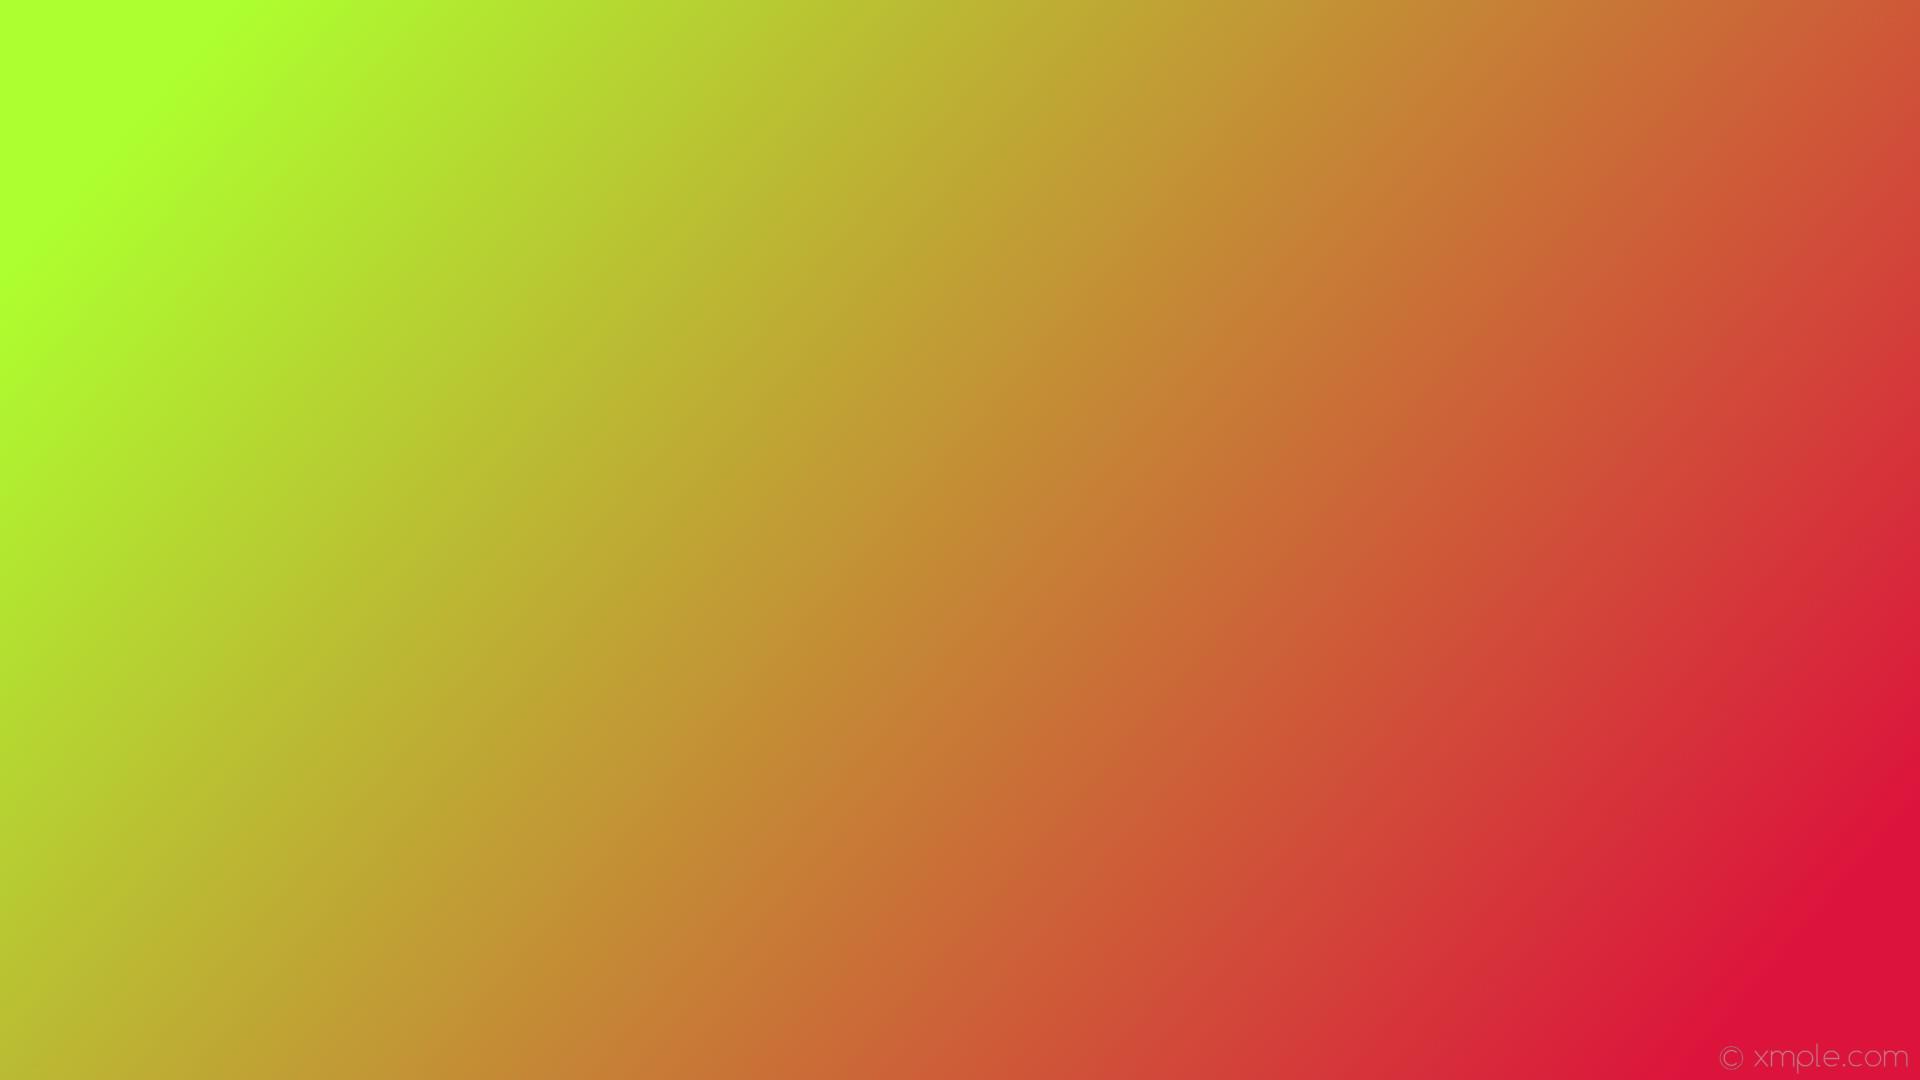 wallpaper linear red gradient green crimson green yellow #dc143c #adff2f  345°